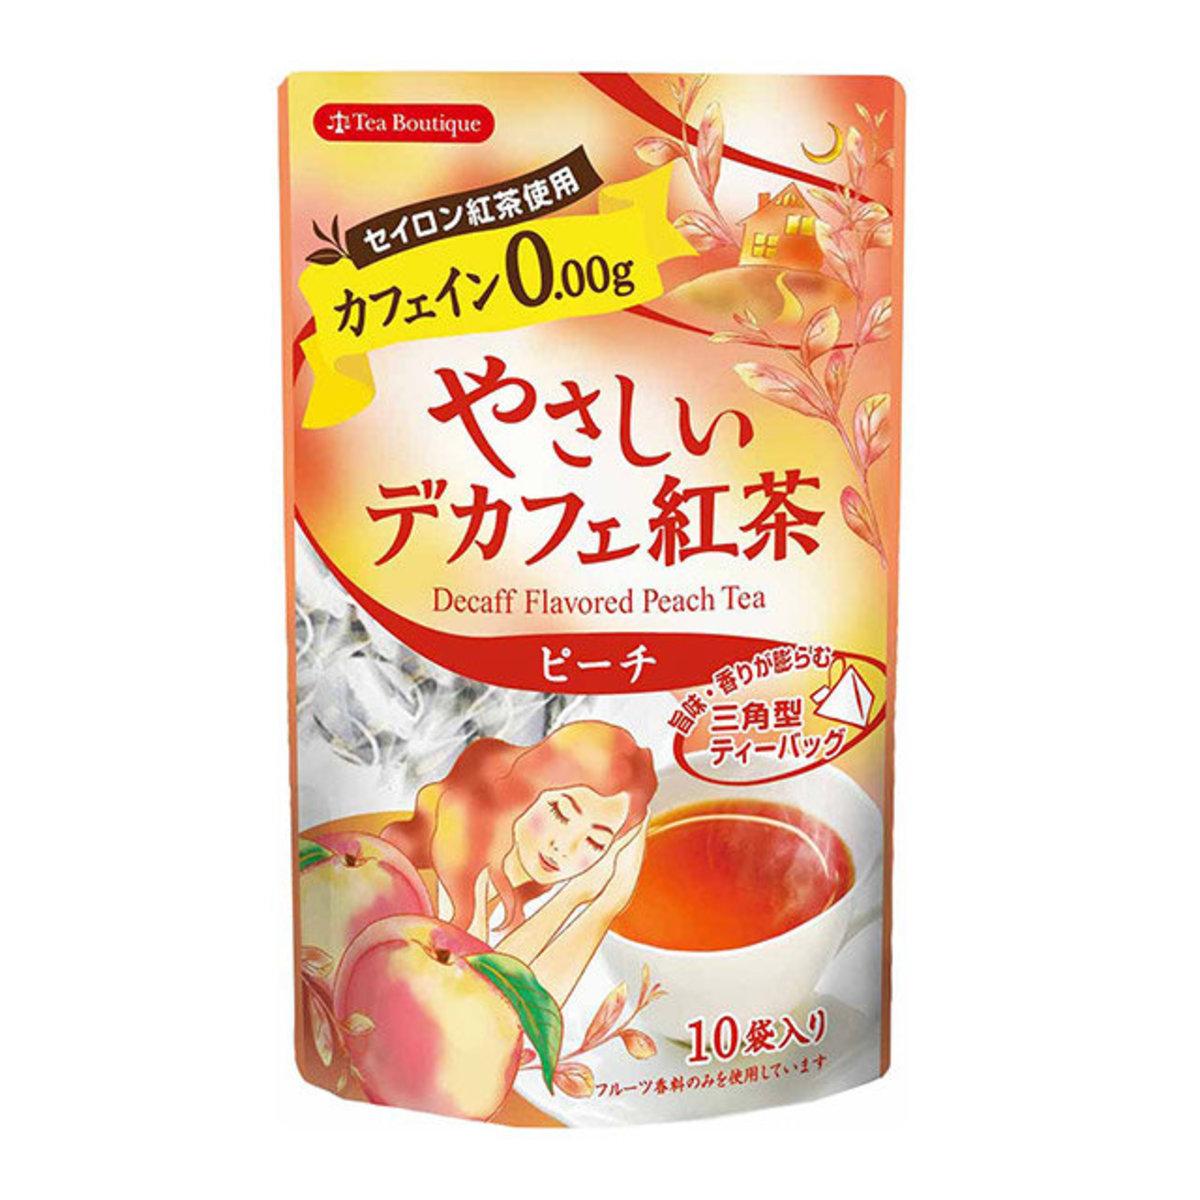 Decaff Flavored Peach Tea(1.2g×10pic) -Orange